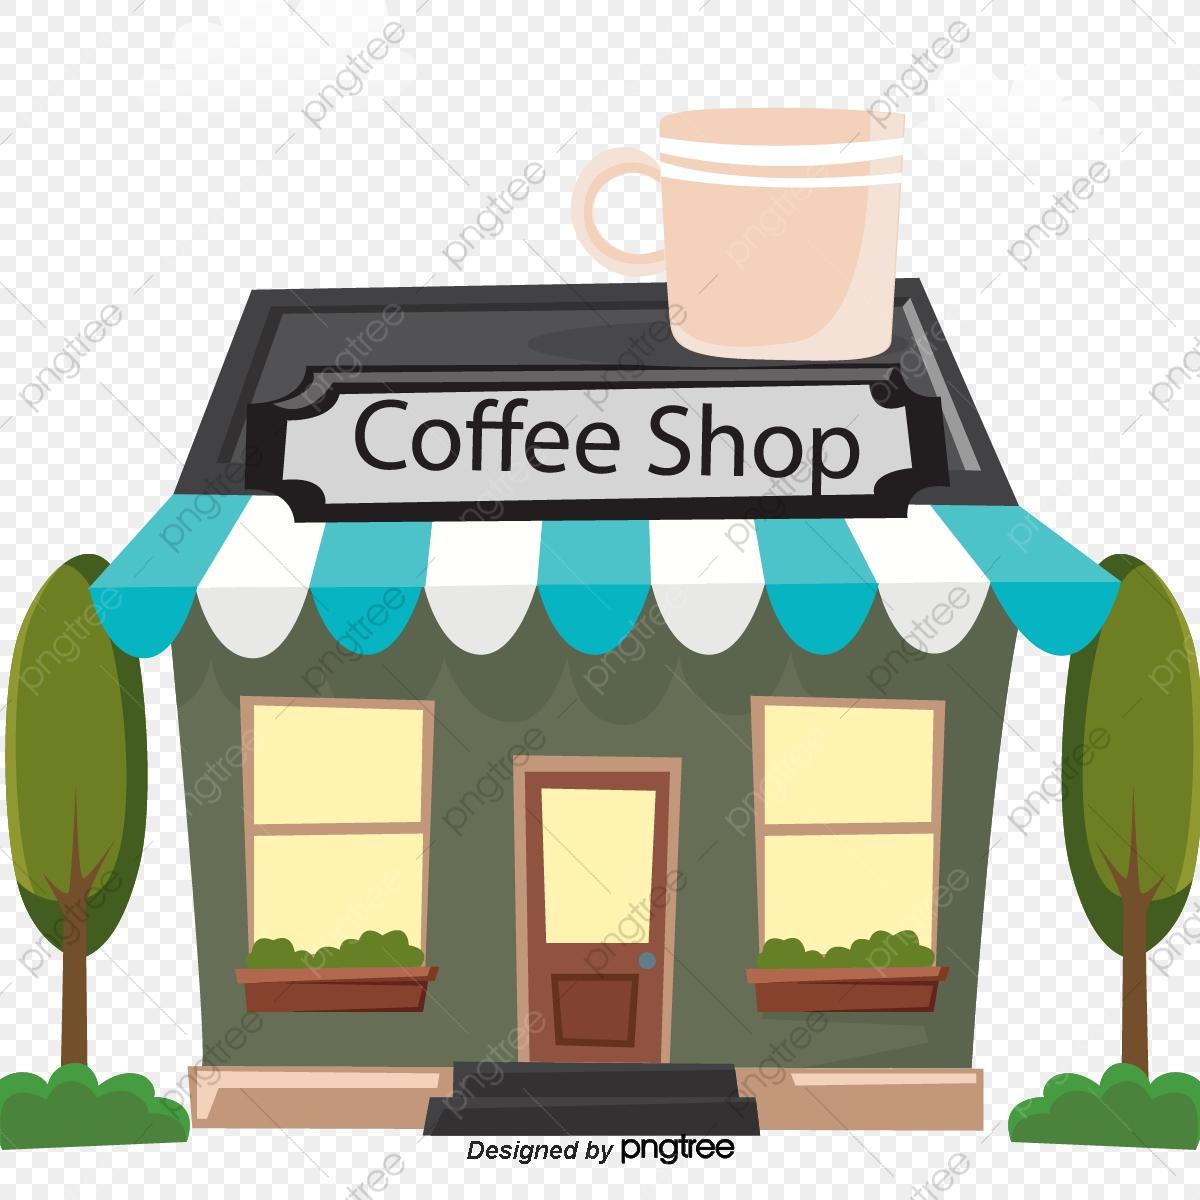 Illustration Coffee Shop, Shop Clipart, Retro Illustration PNG.